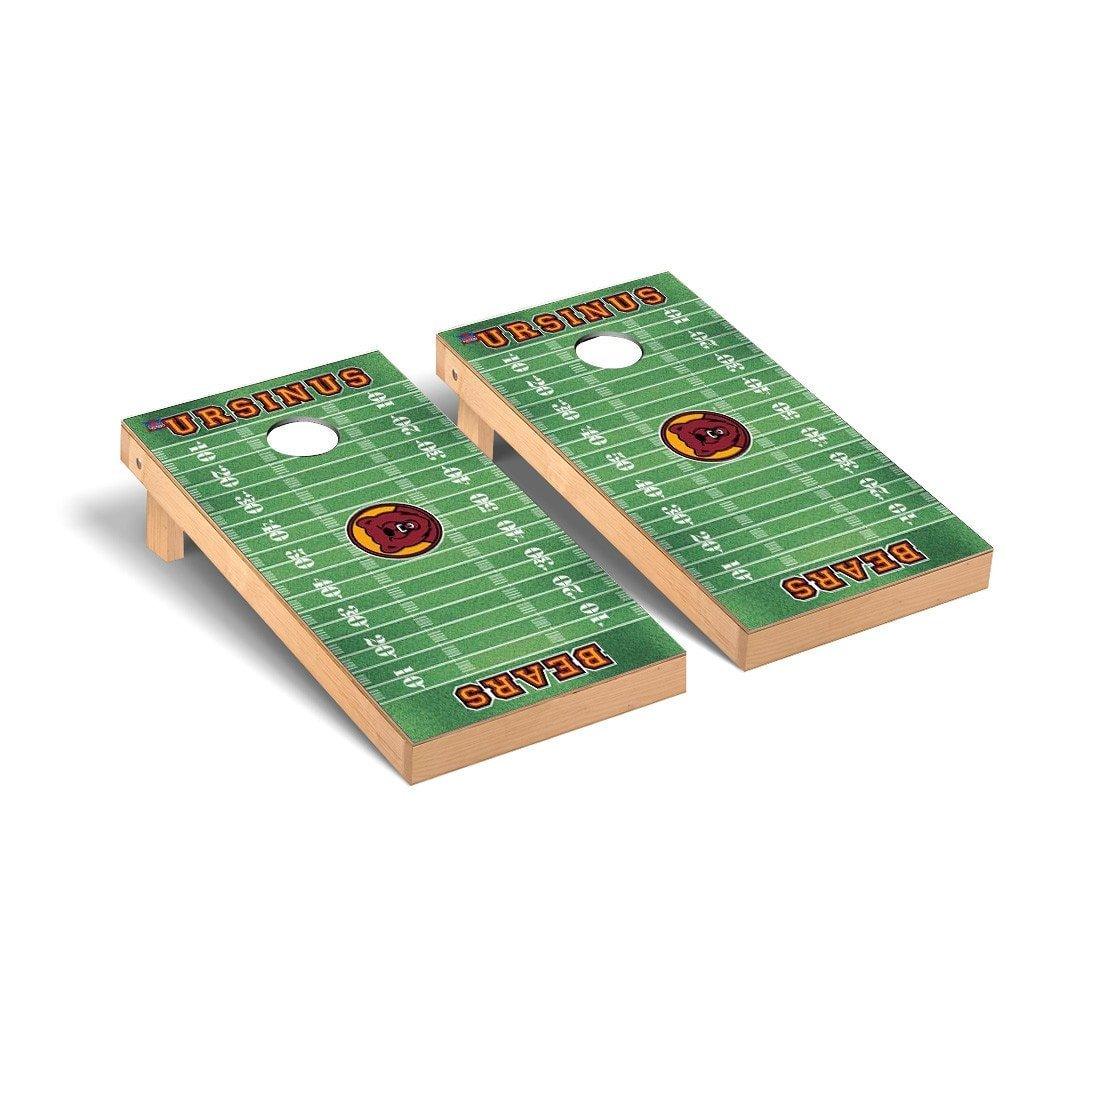 Ursinus College Bears Cornholeゲームセットフットボールフィールドバージョン B011665HLS